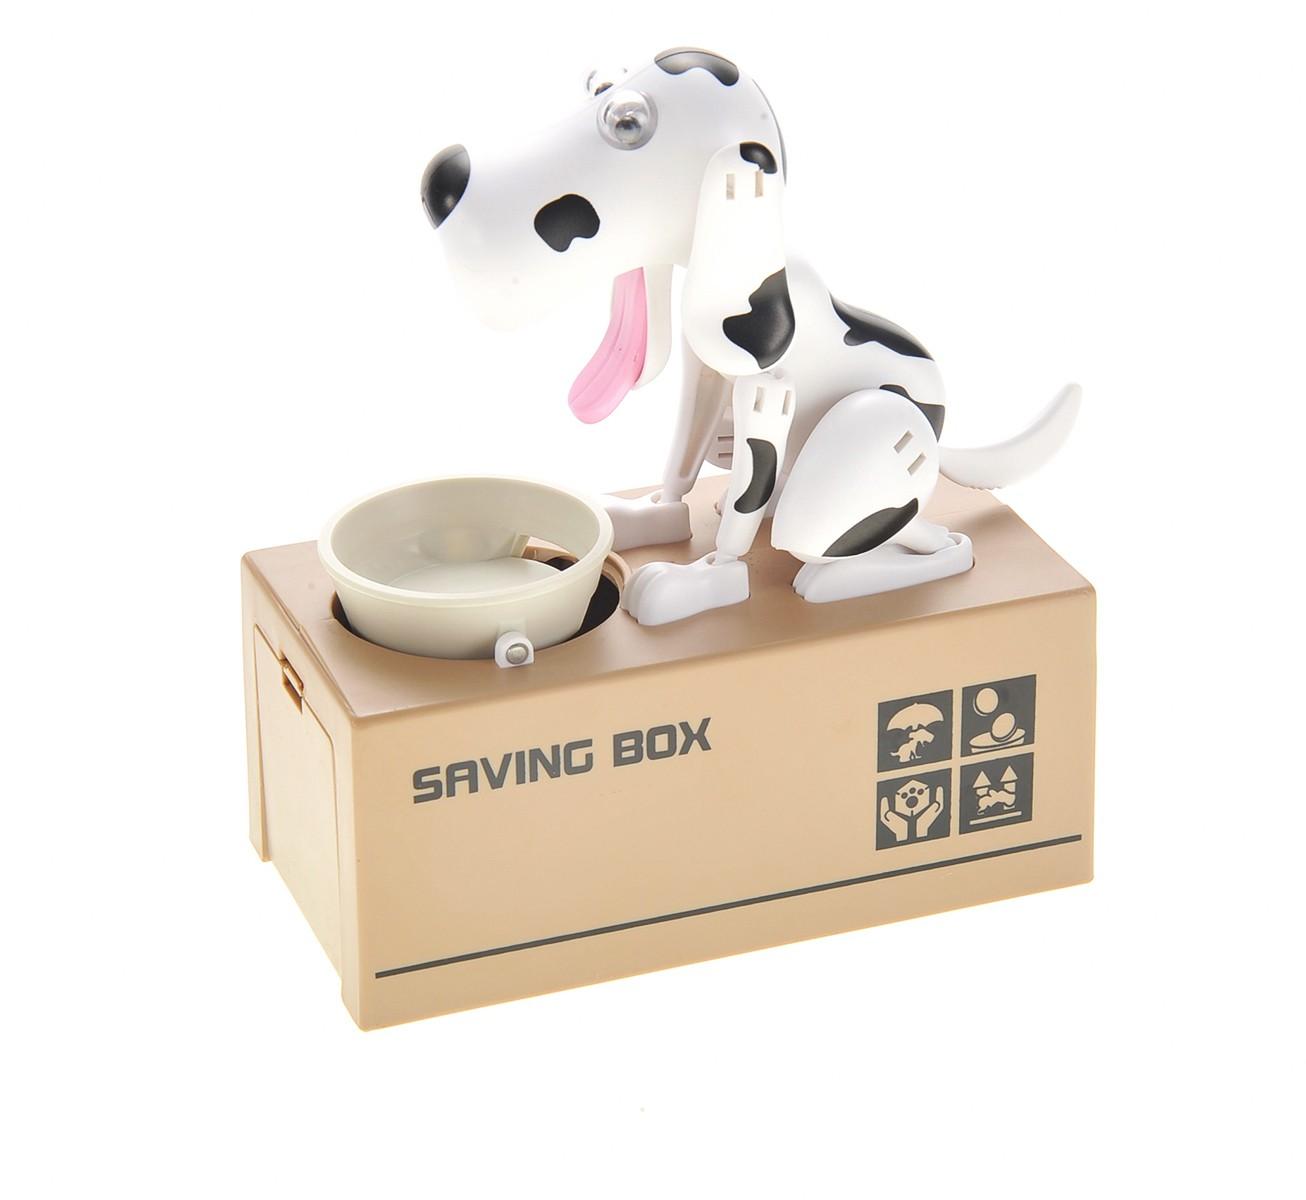 My Dog Piggy Bank - Robotic Coin Munching Money Box (White Black)